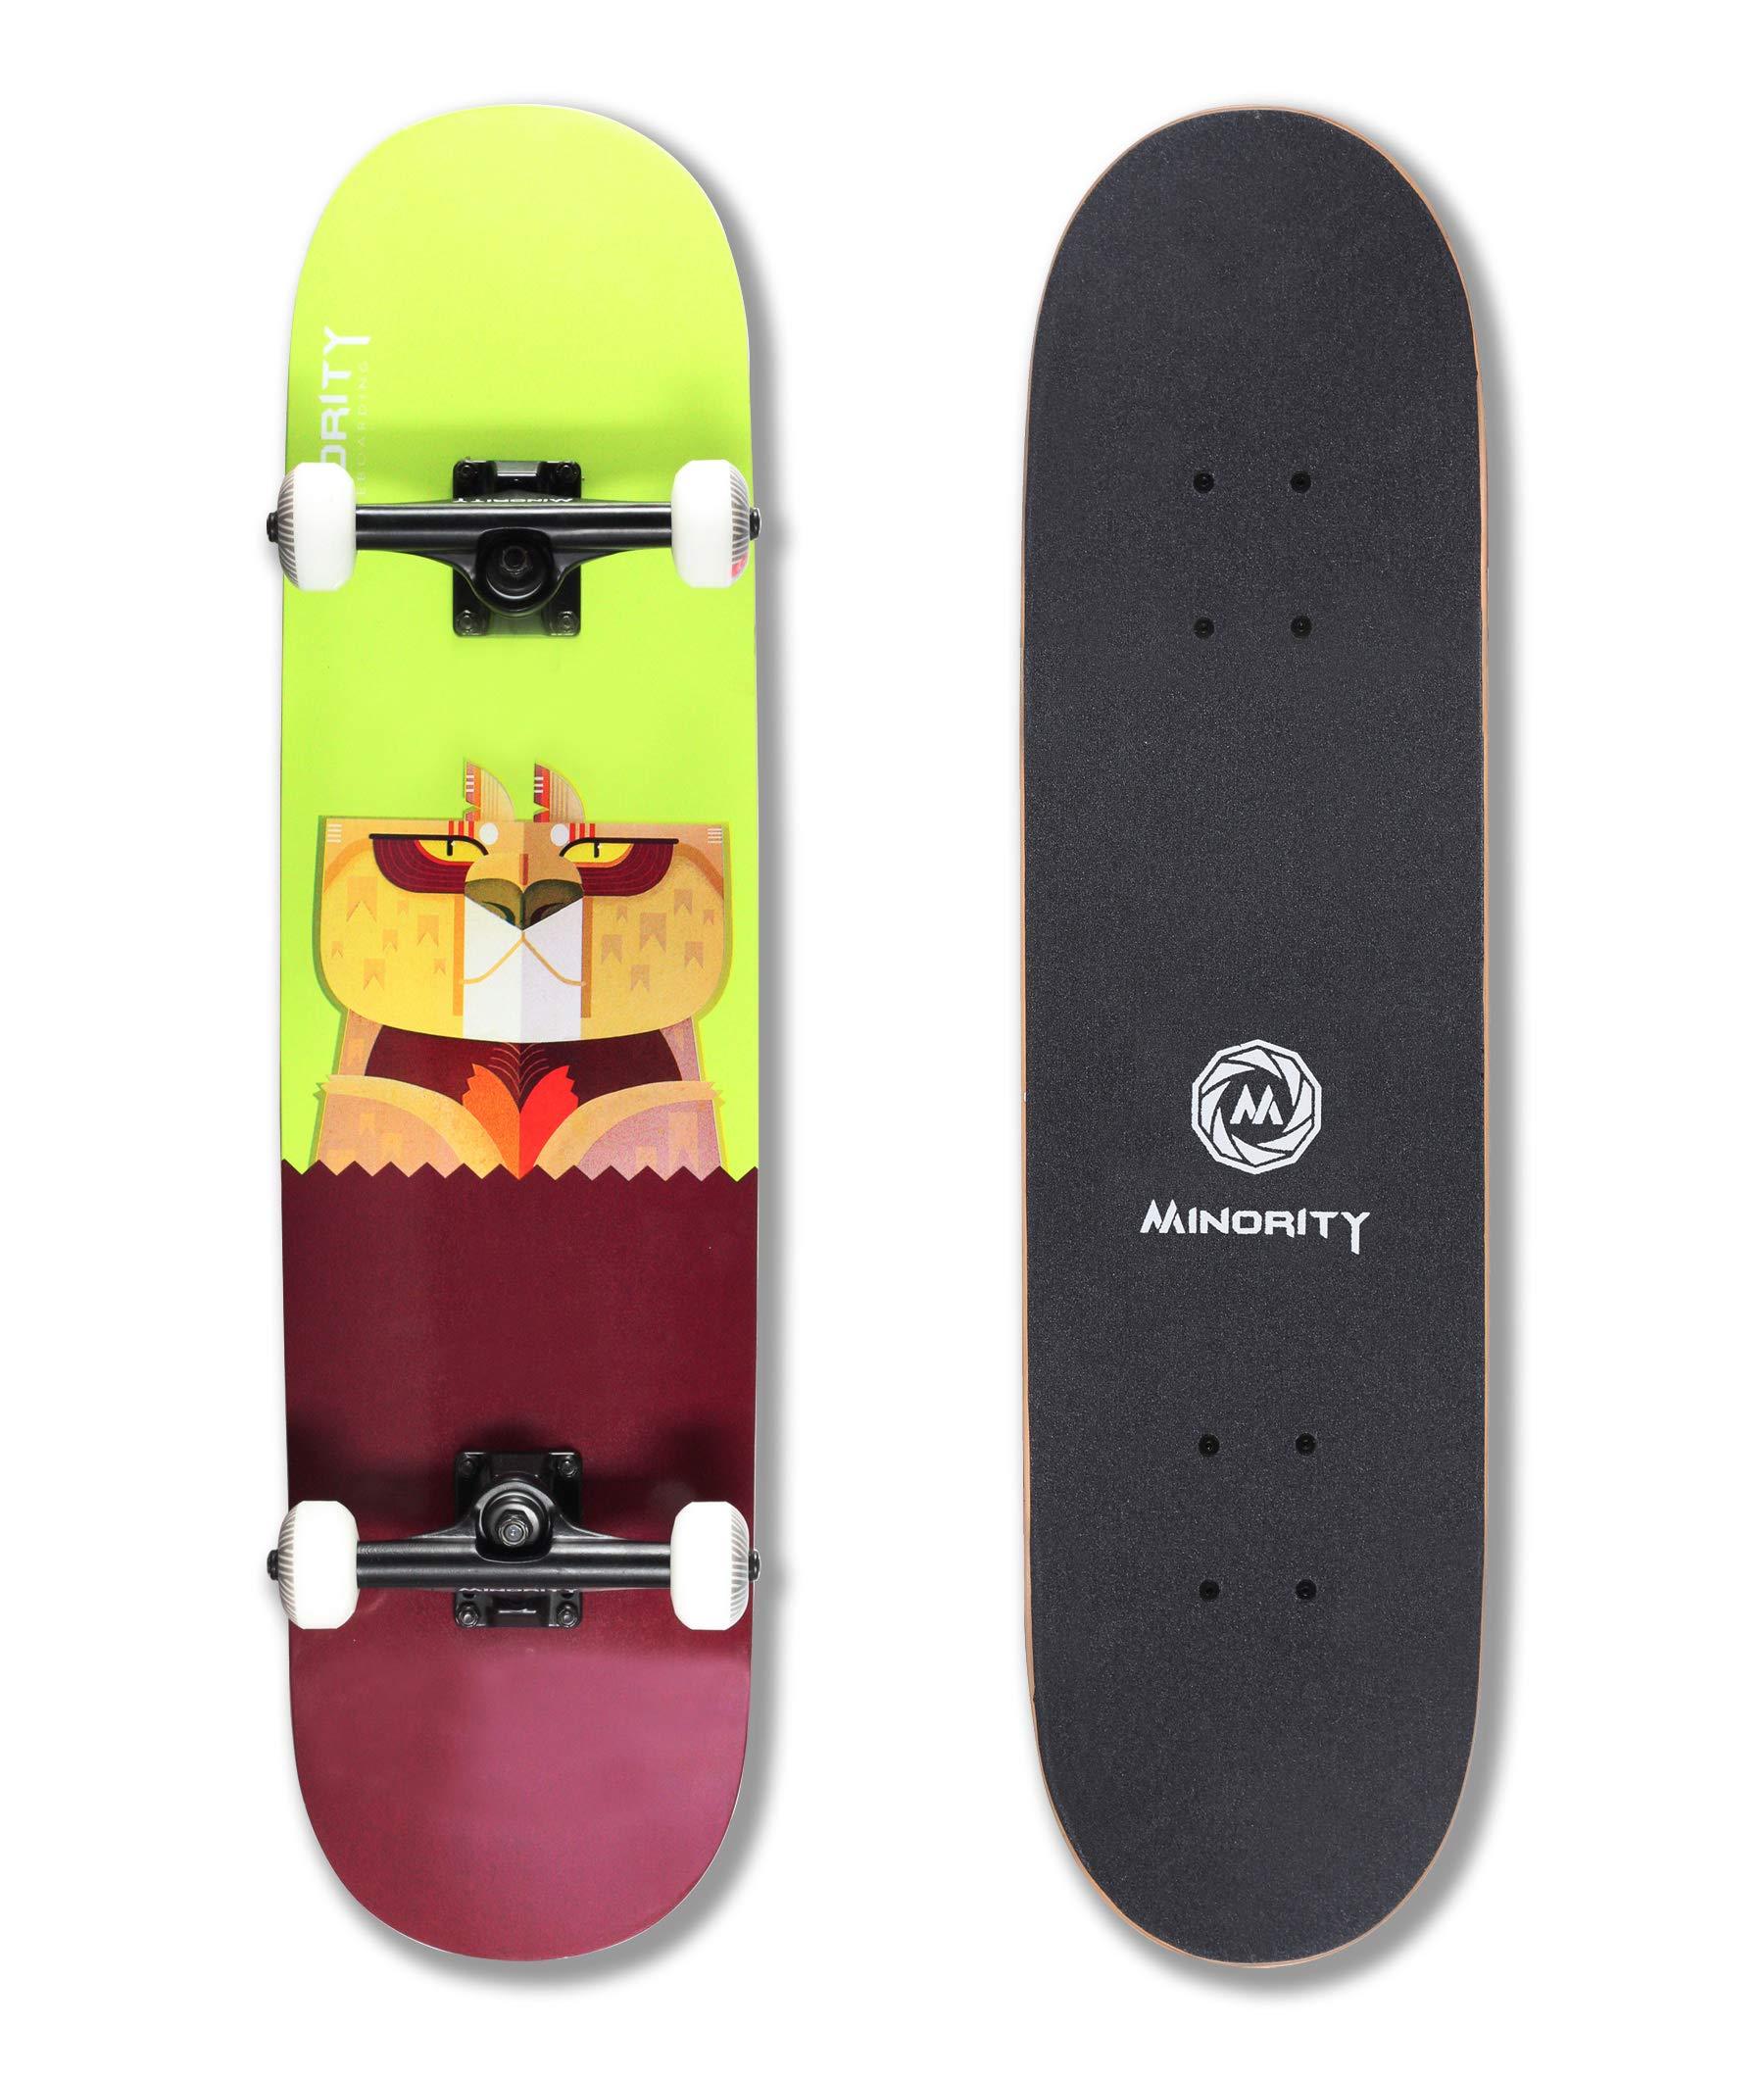 MINORITY 32inch Maple Skateboard (Cheetah) by MINORITY